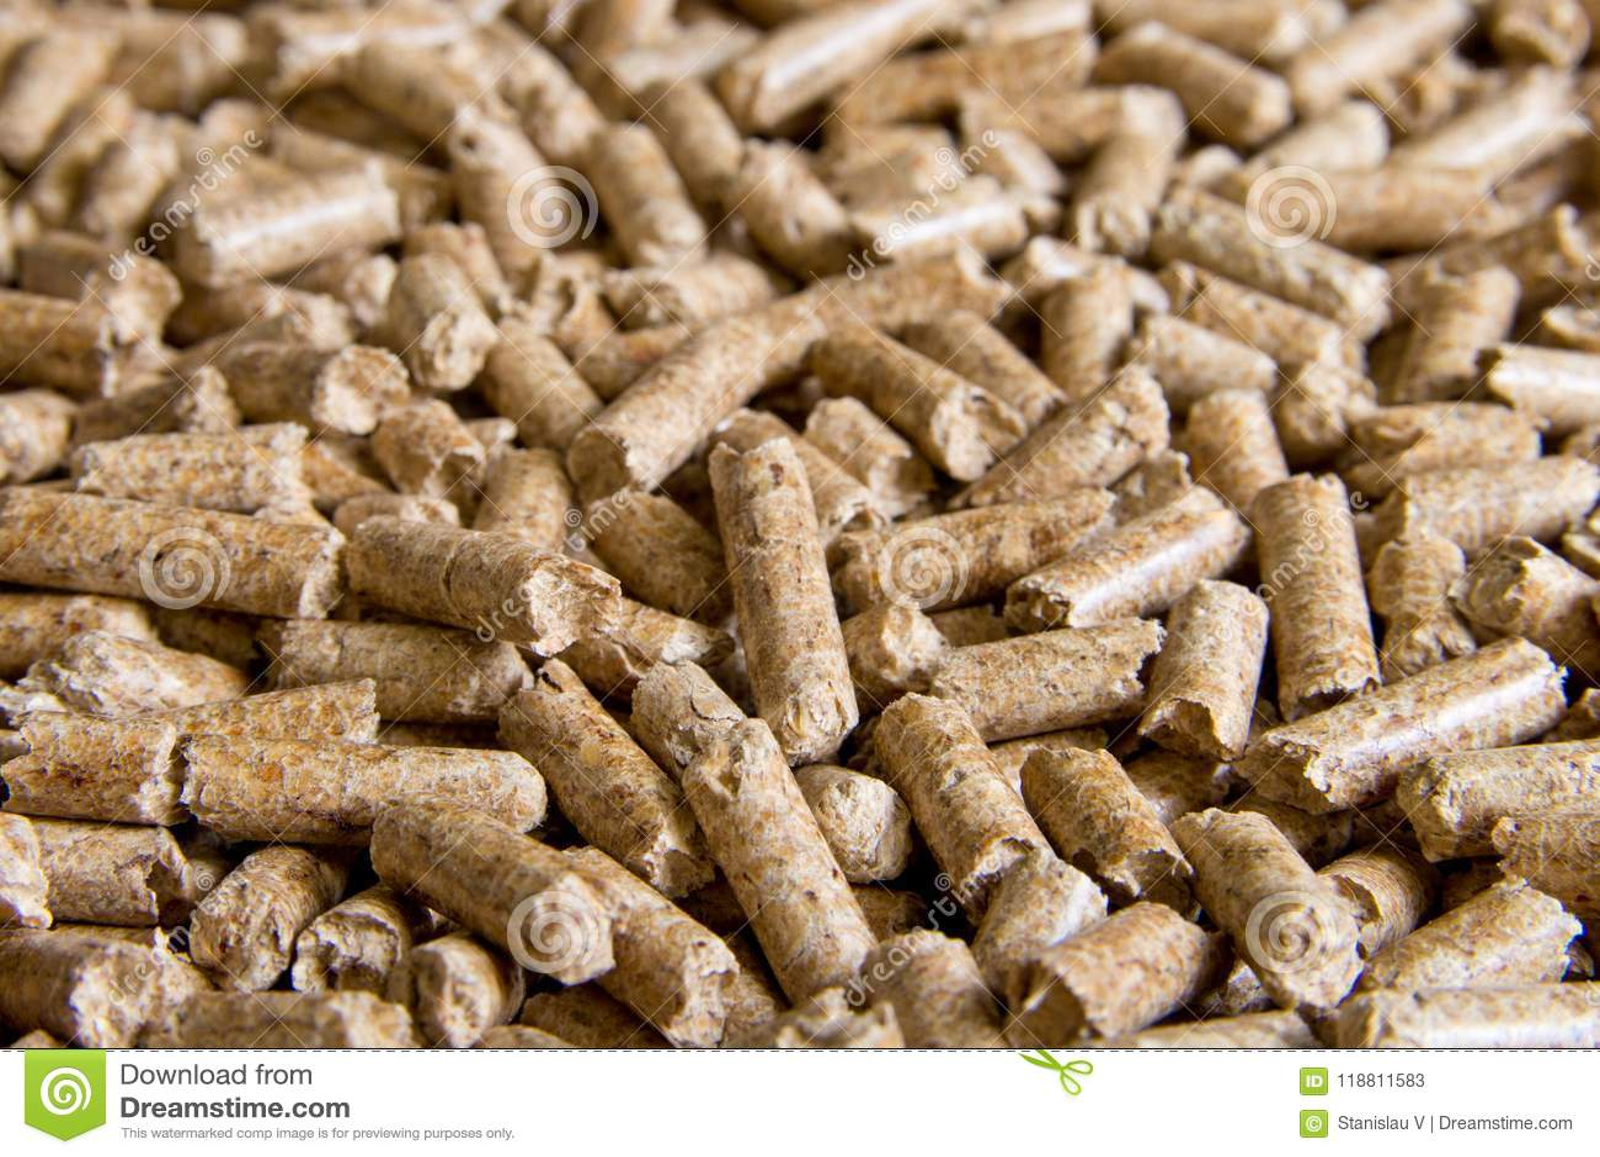 Wood pellets close up .Biofuels. Biomass Pellets - cheap energy.